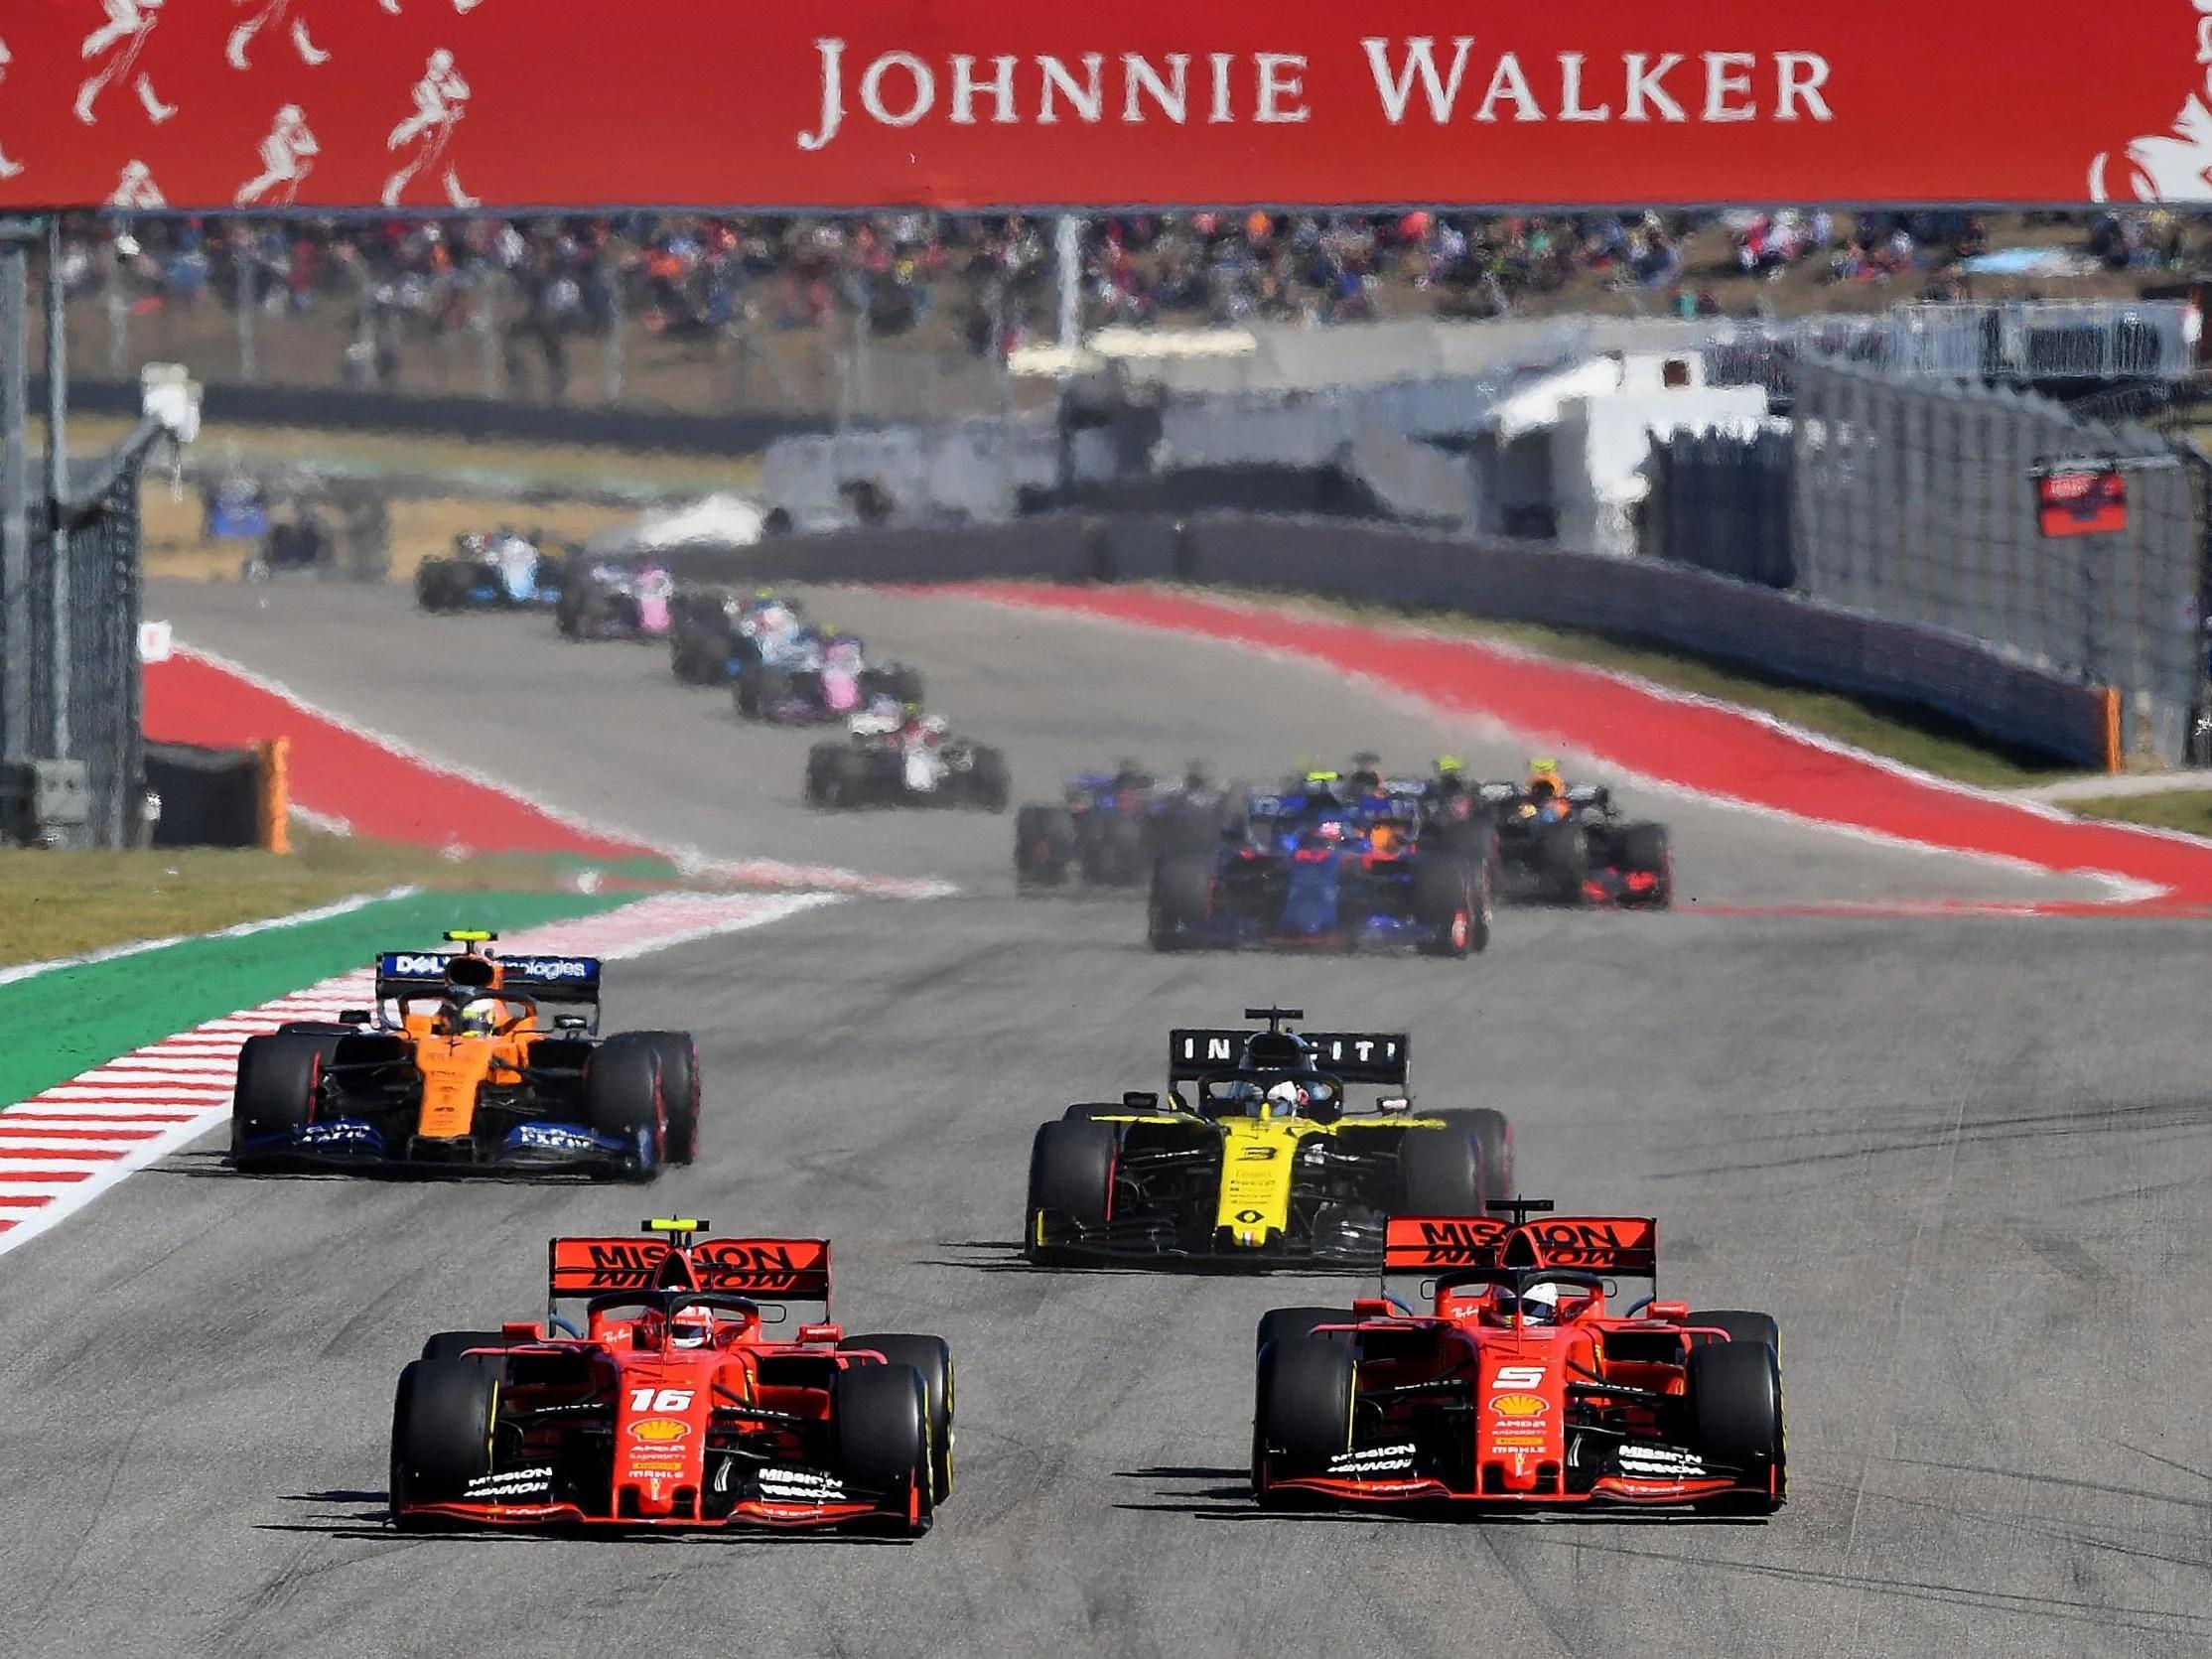 Formula One Outlines Plans For Net Zero Carbon Footprint